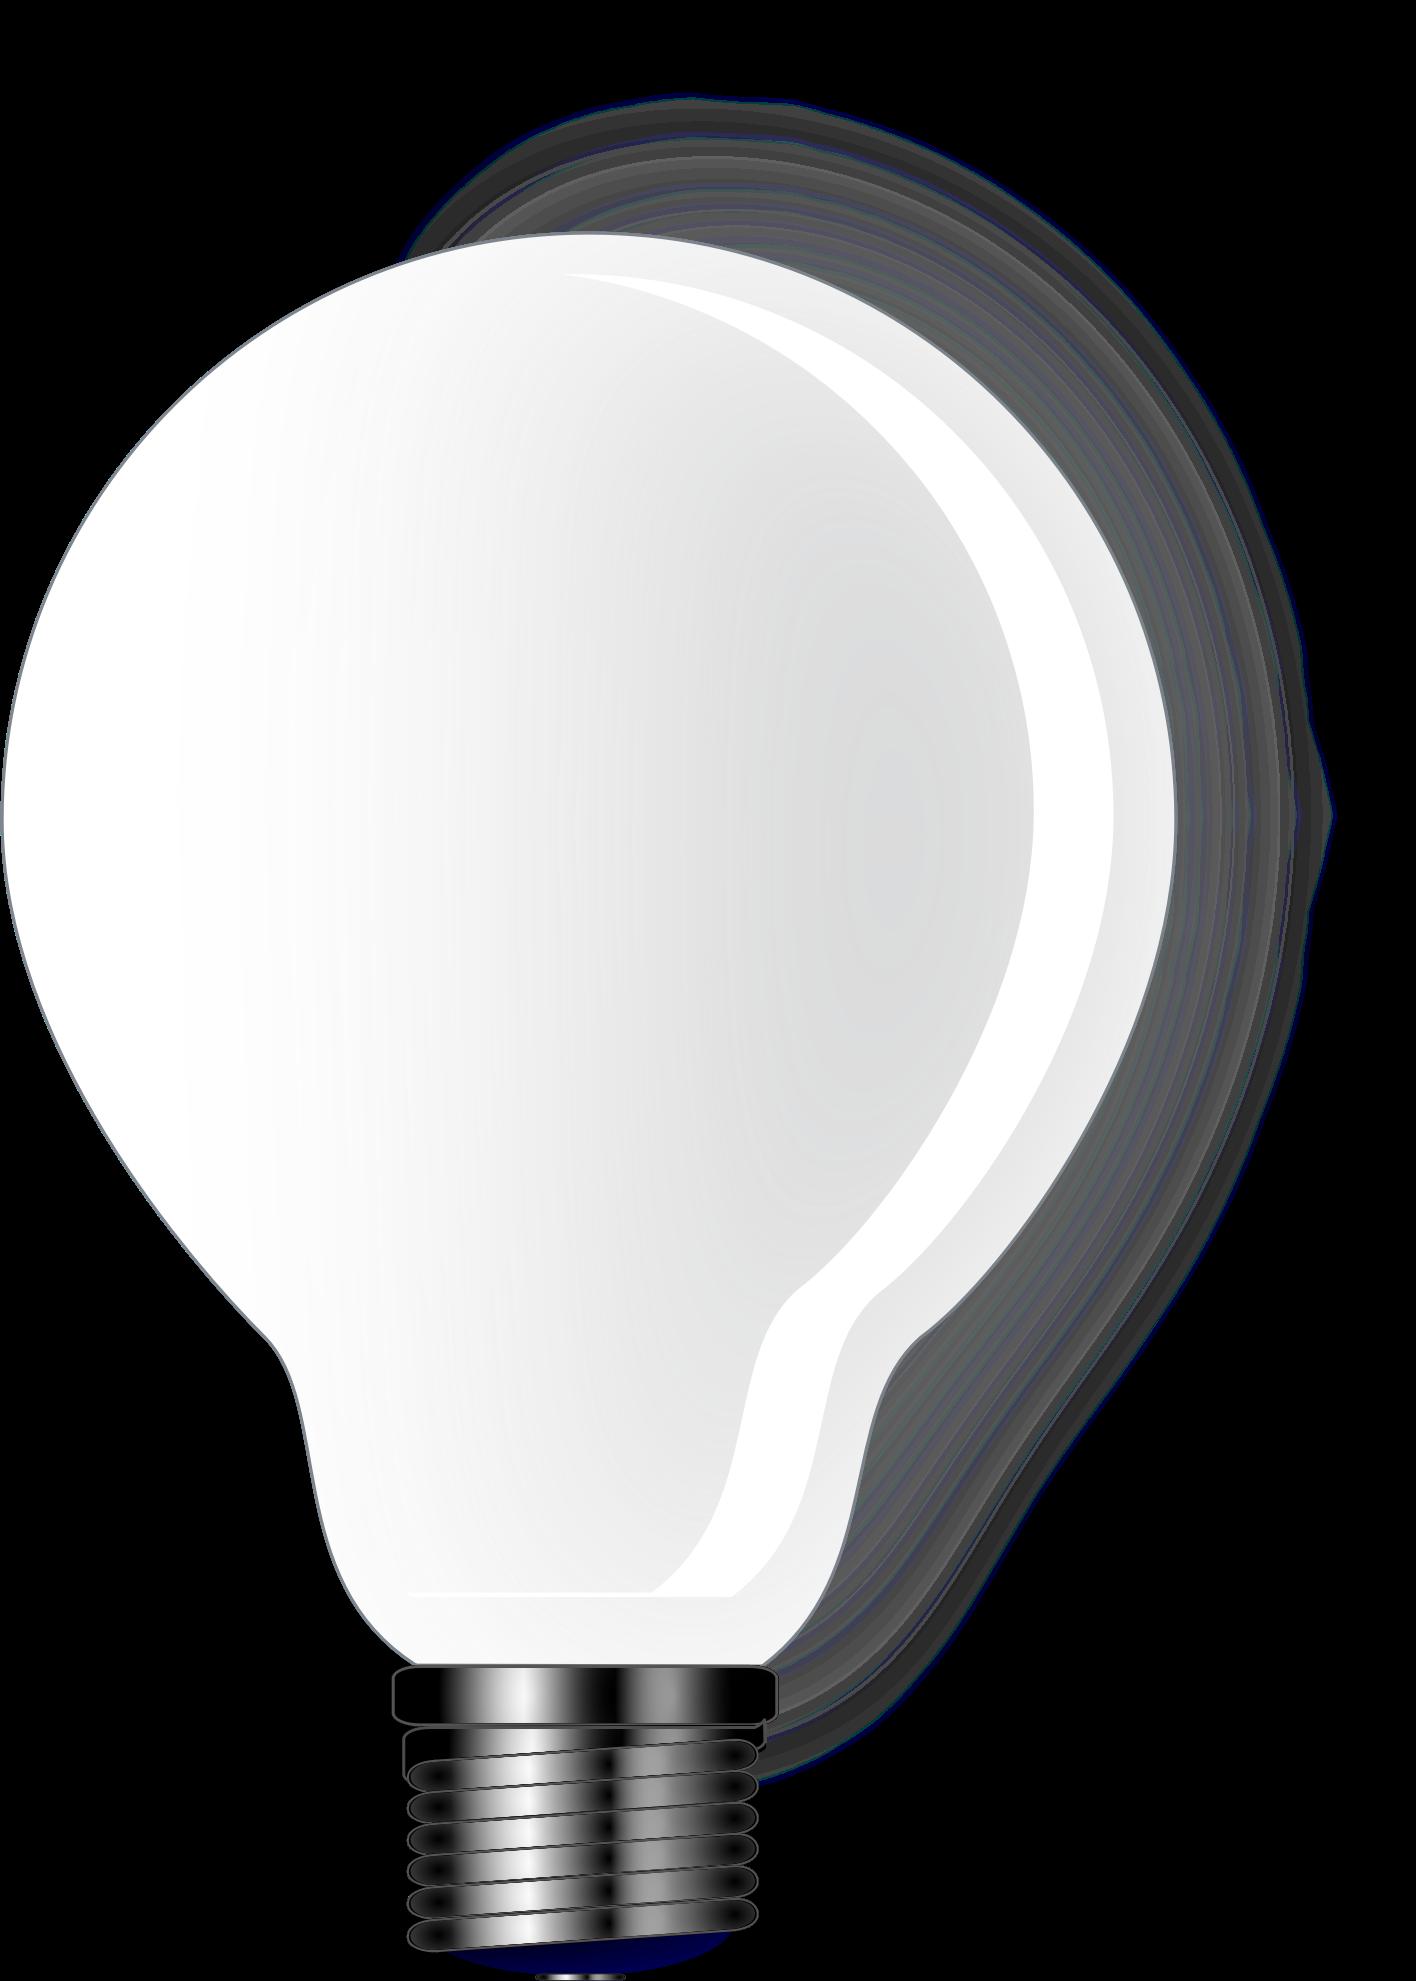 Basic light bulb big. Lamp clipart flourescent lamp